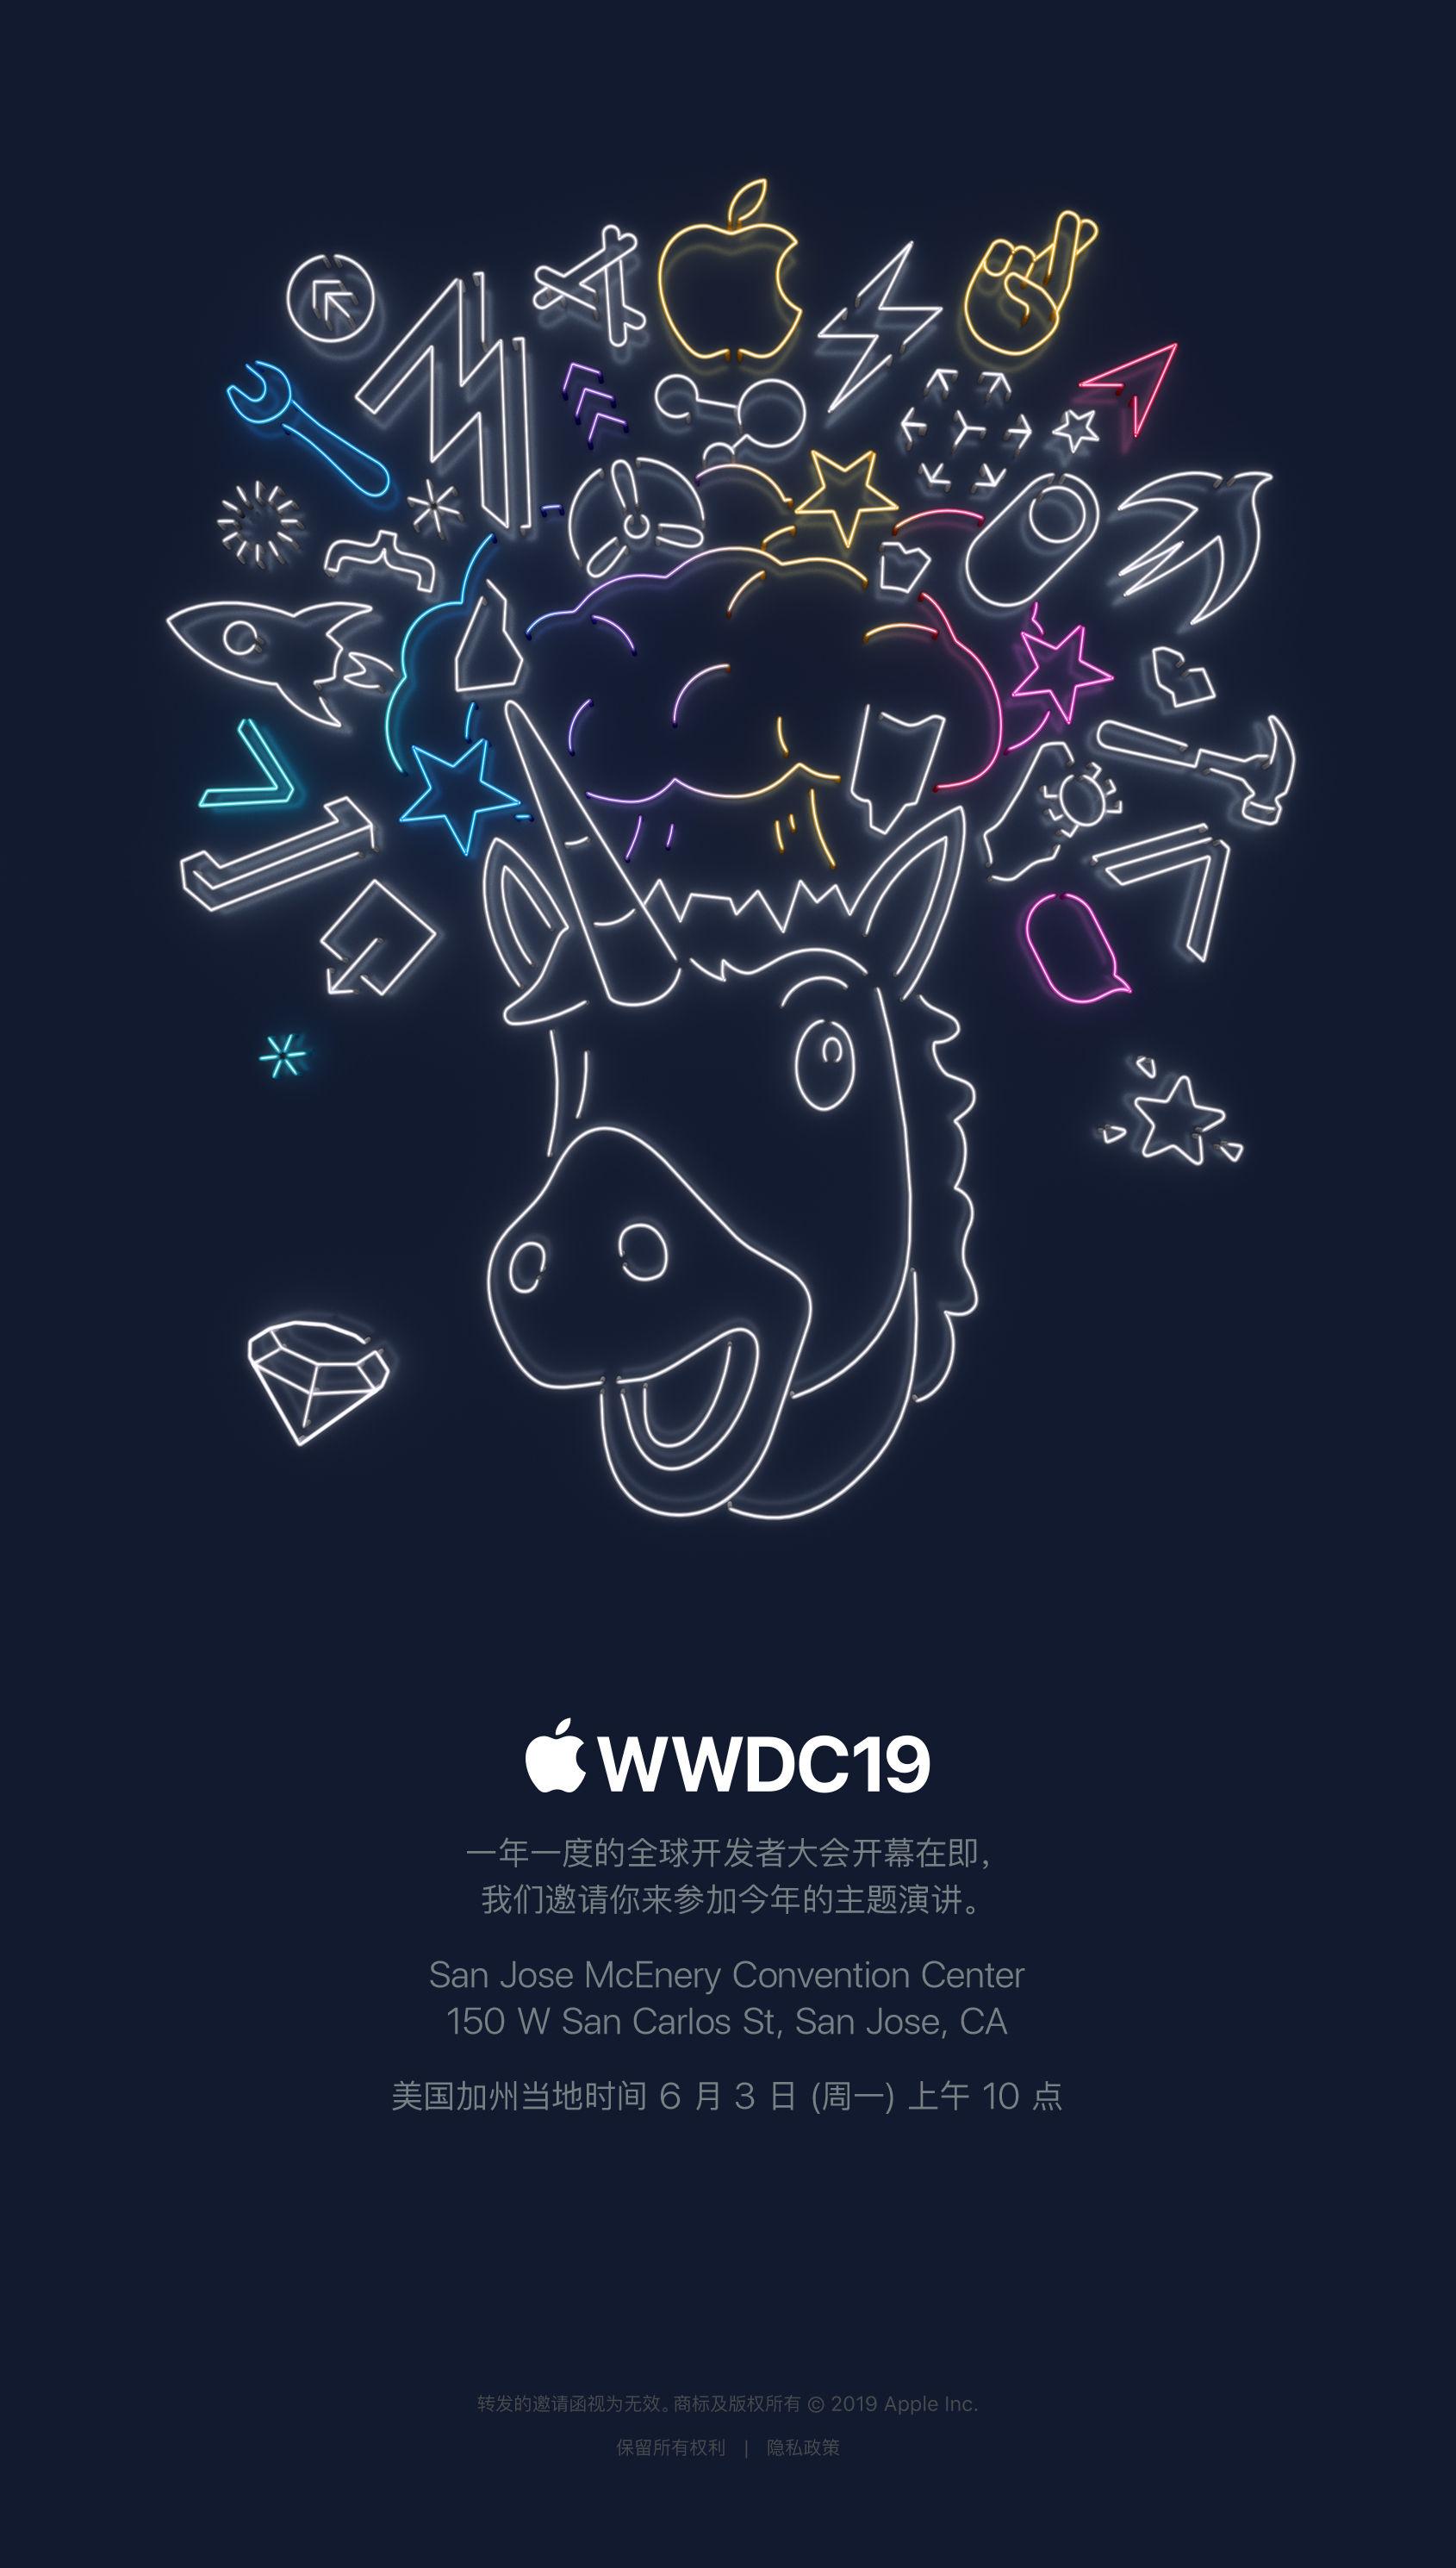 Apple发出WWDC19媒体邀请函:会有重磅硬件产品吗